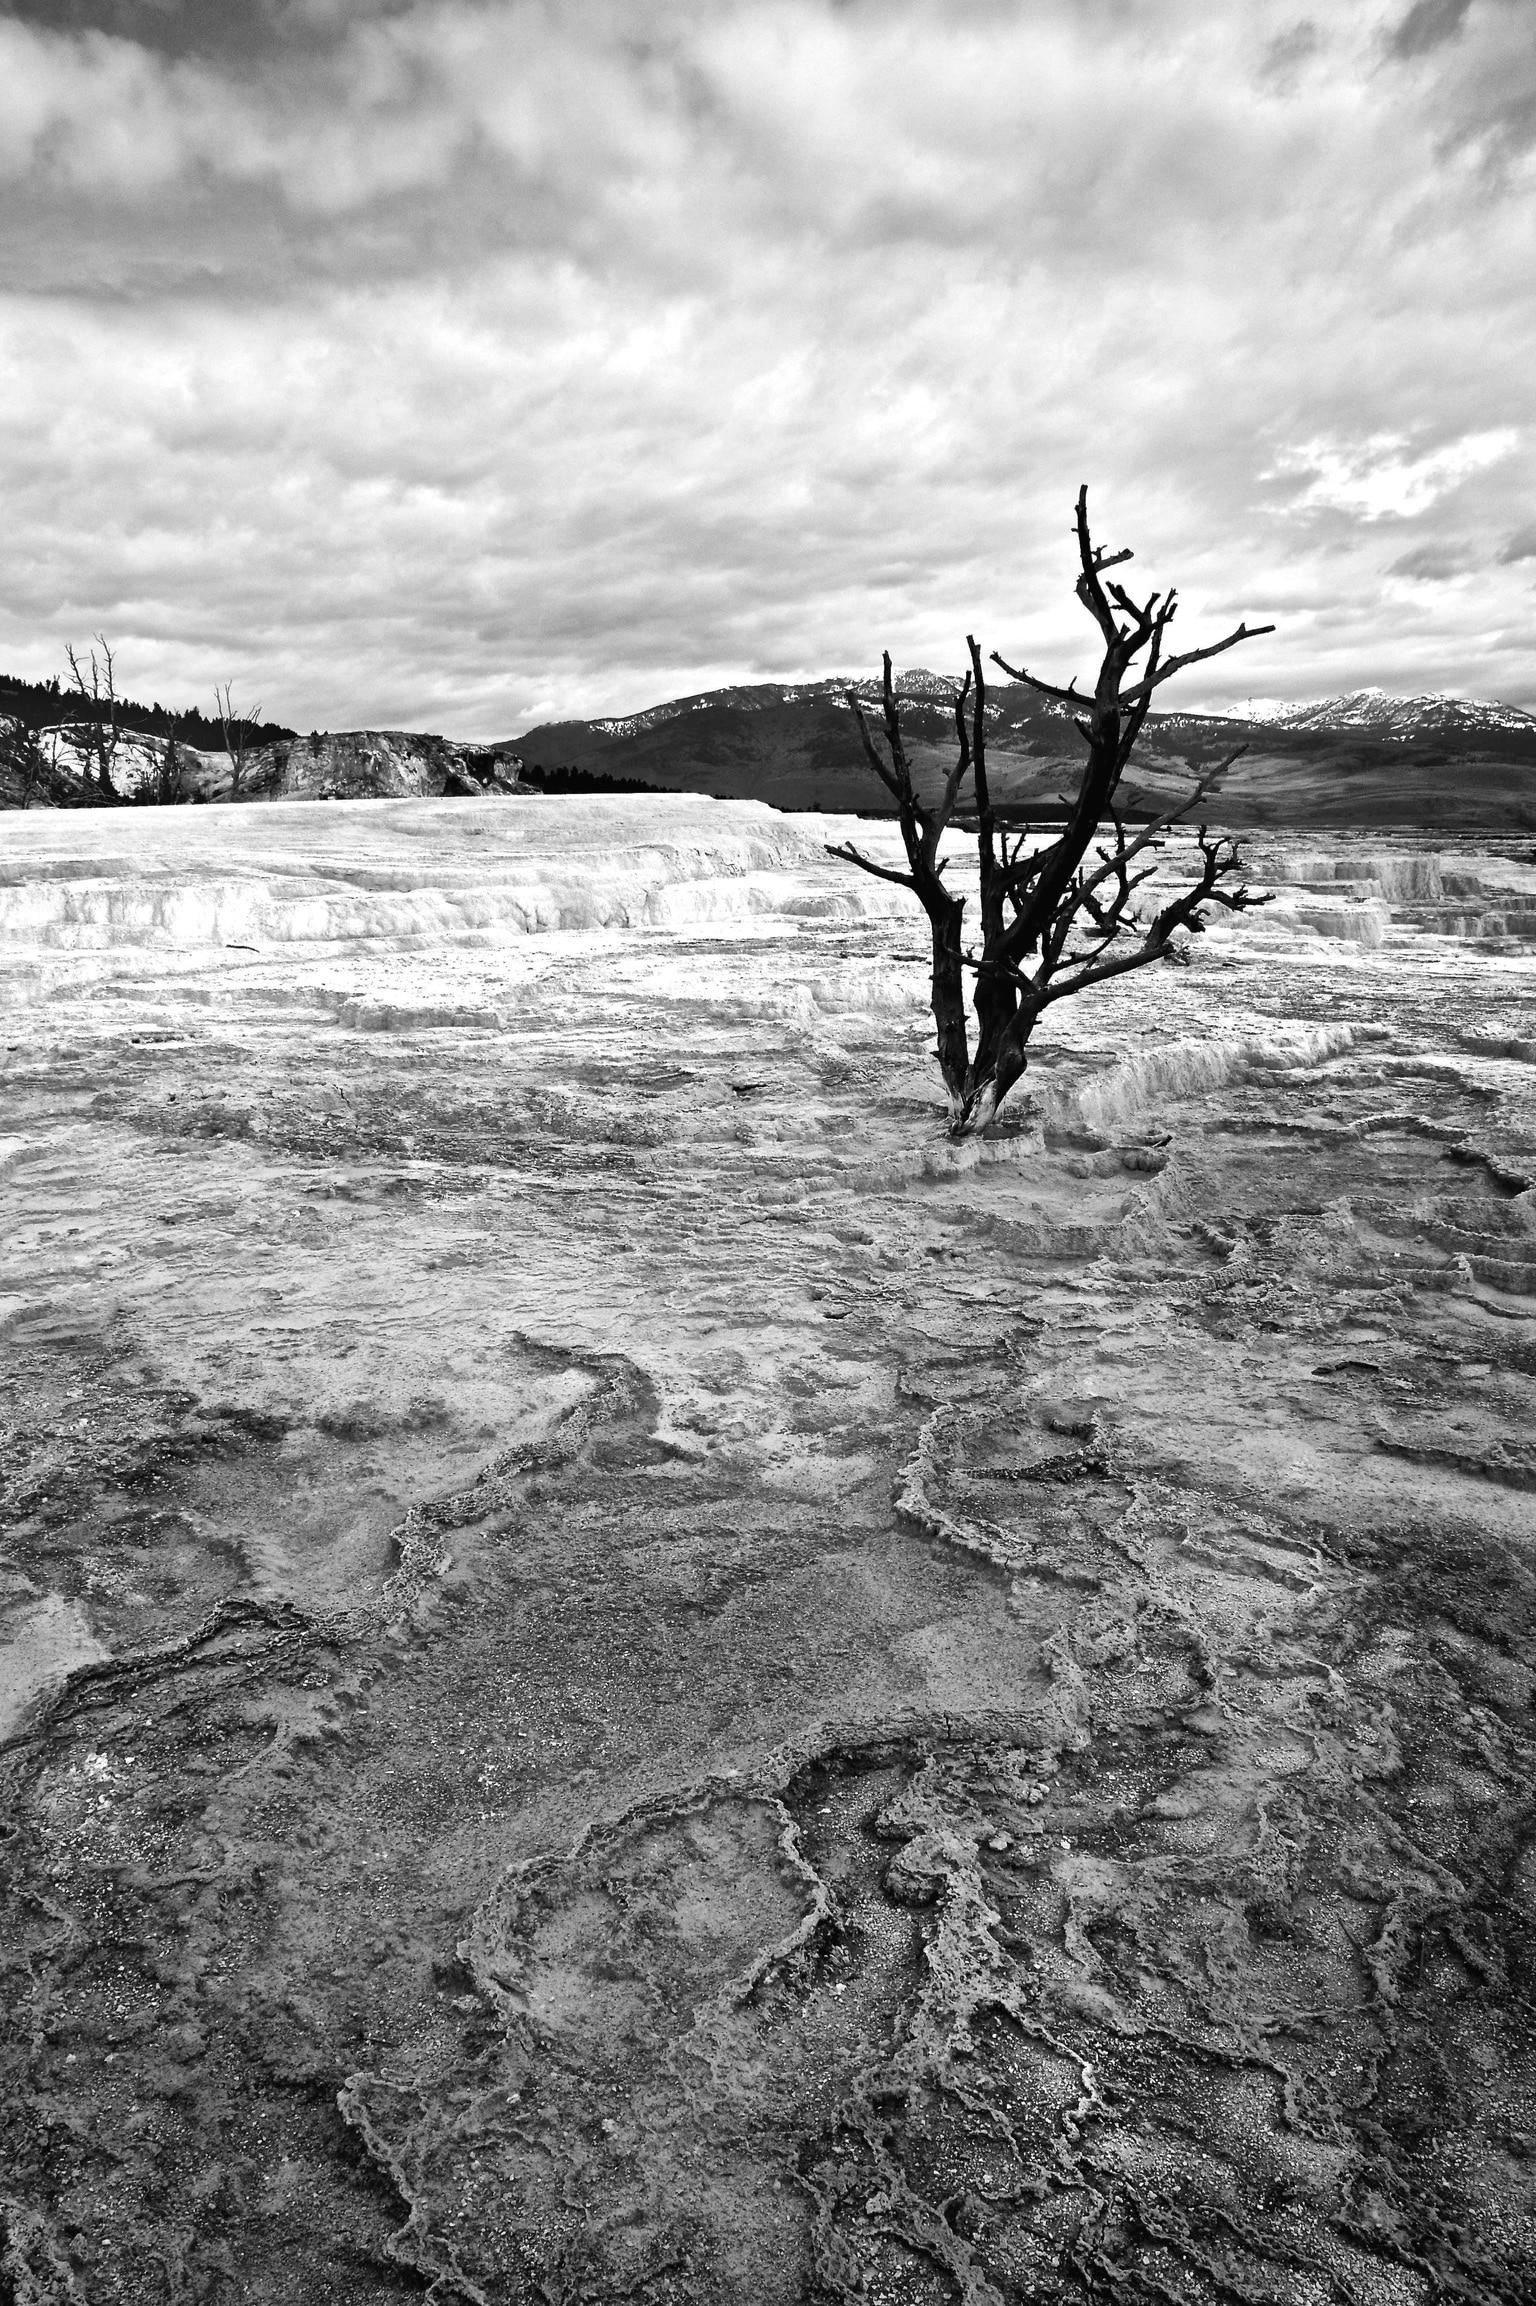 Dead tree among soda deposits